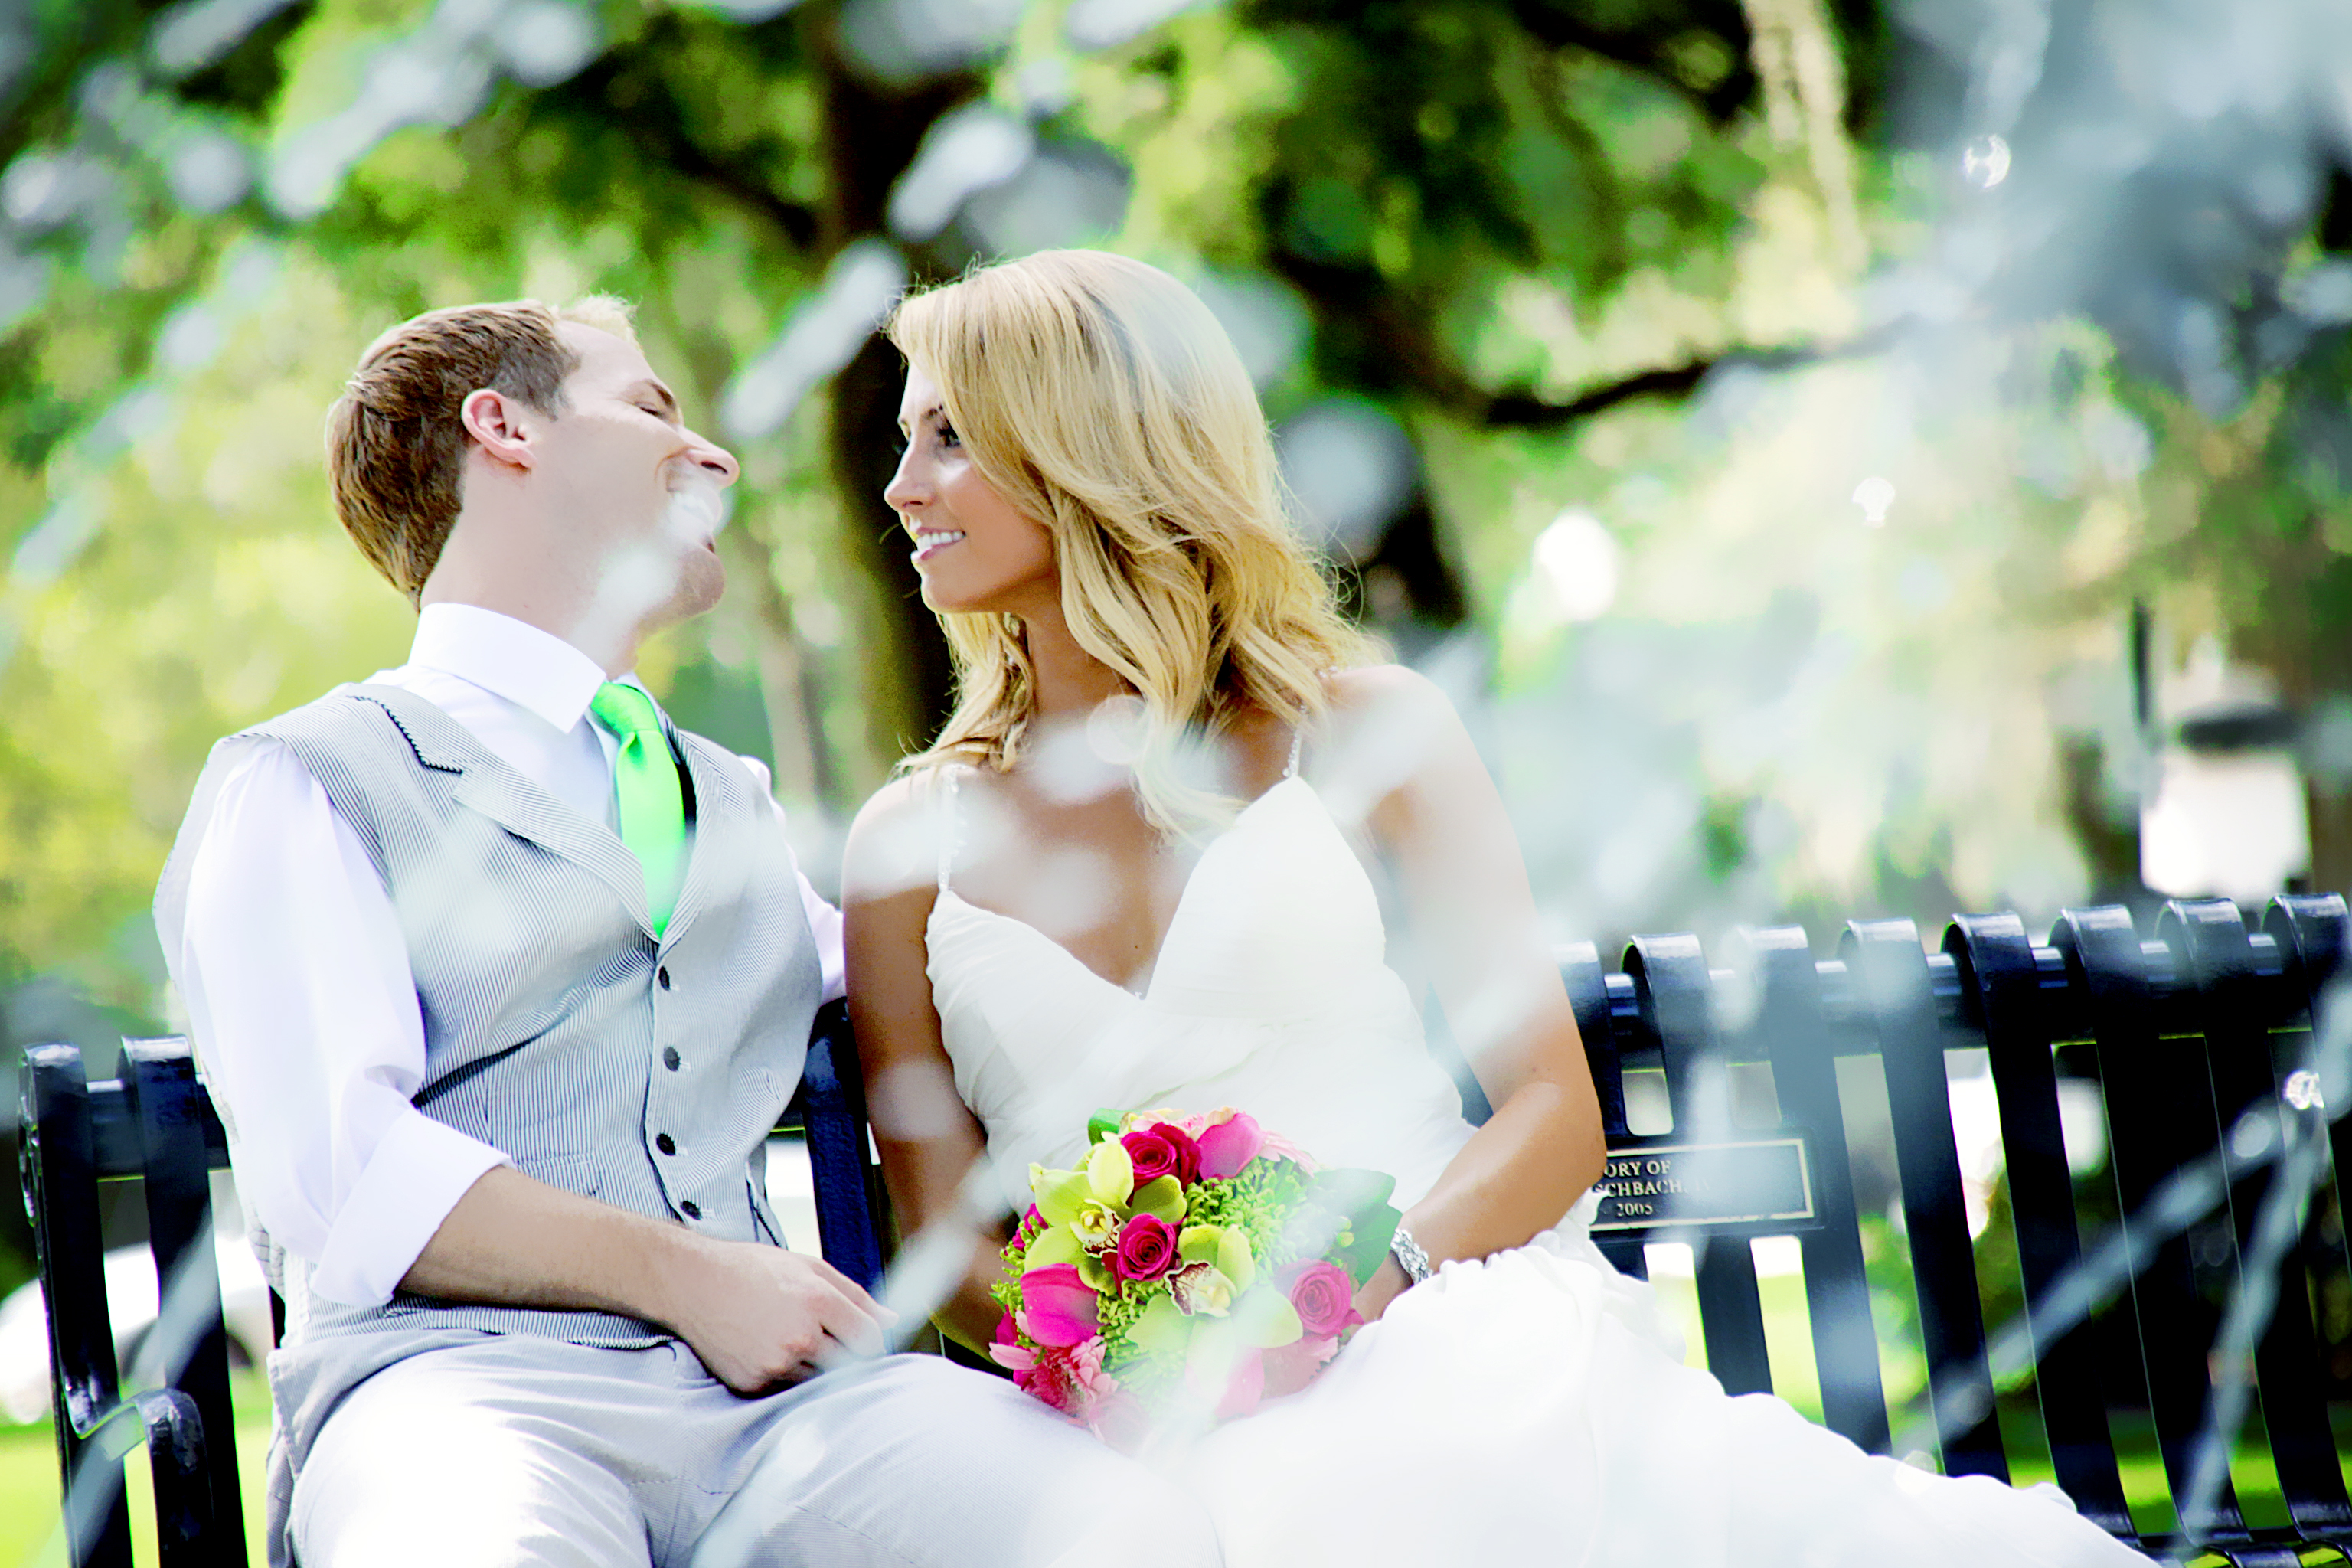 cool wedding photo ideas